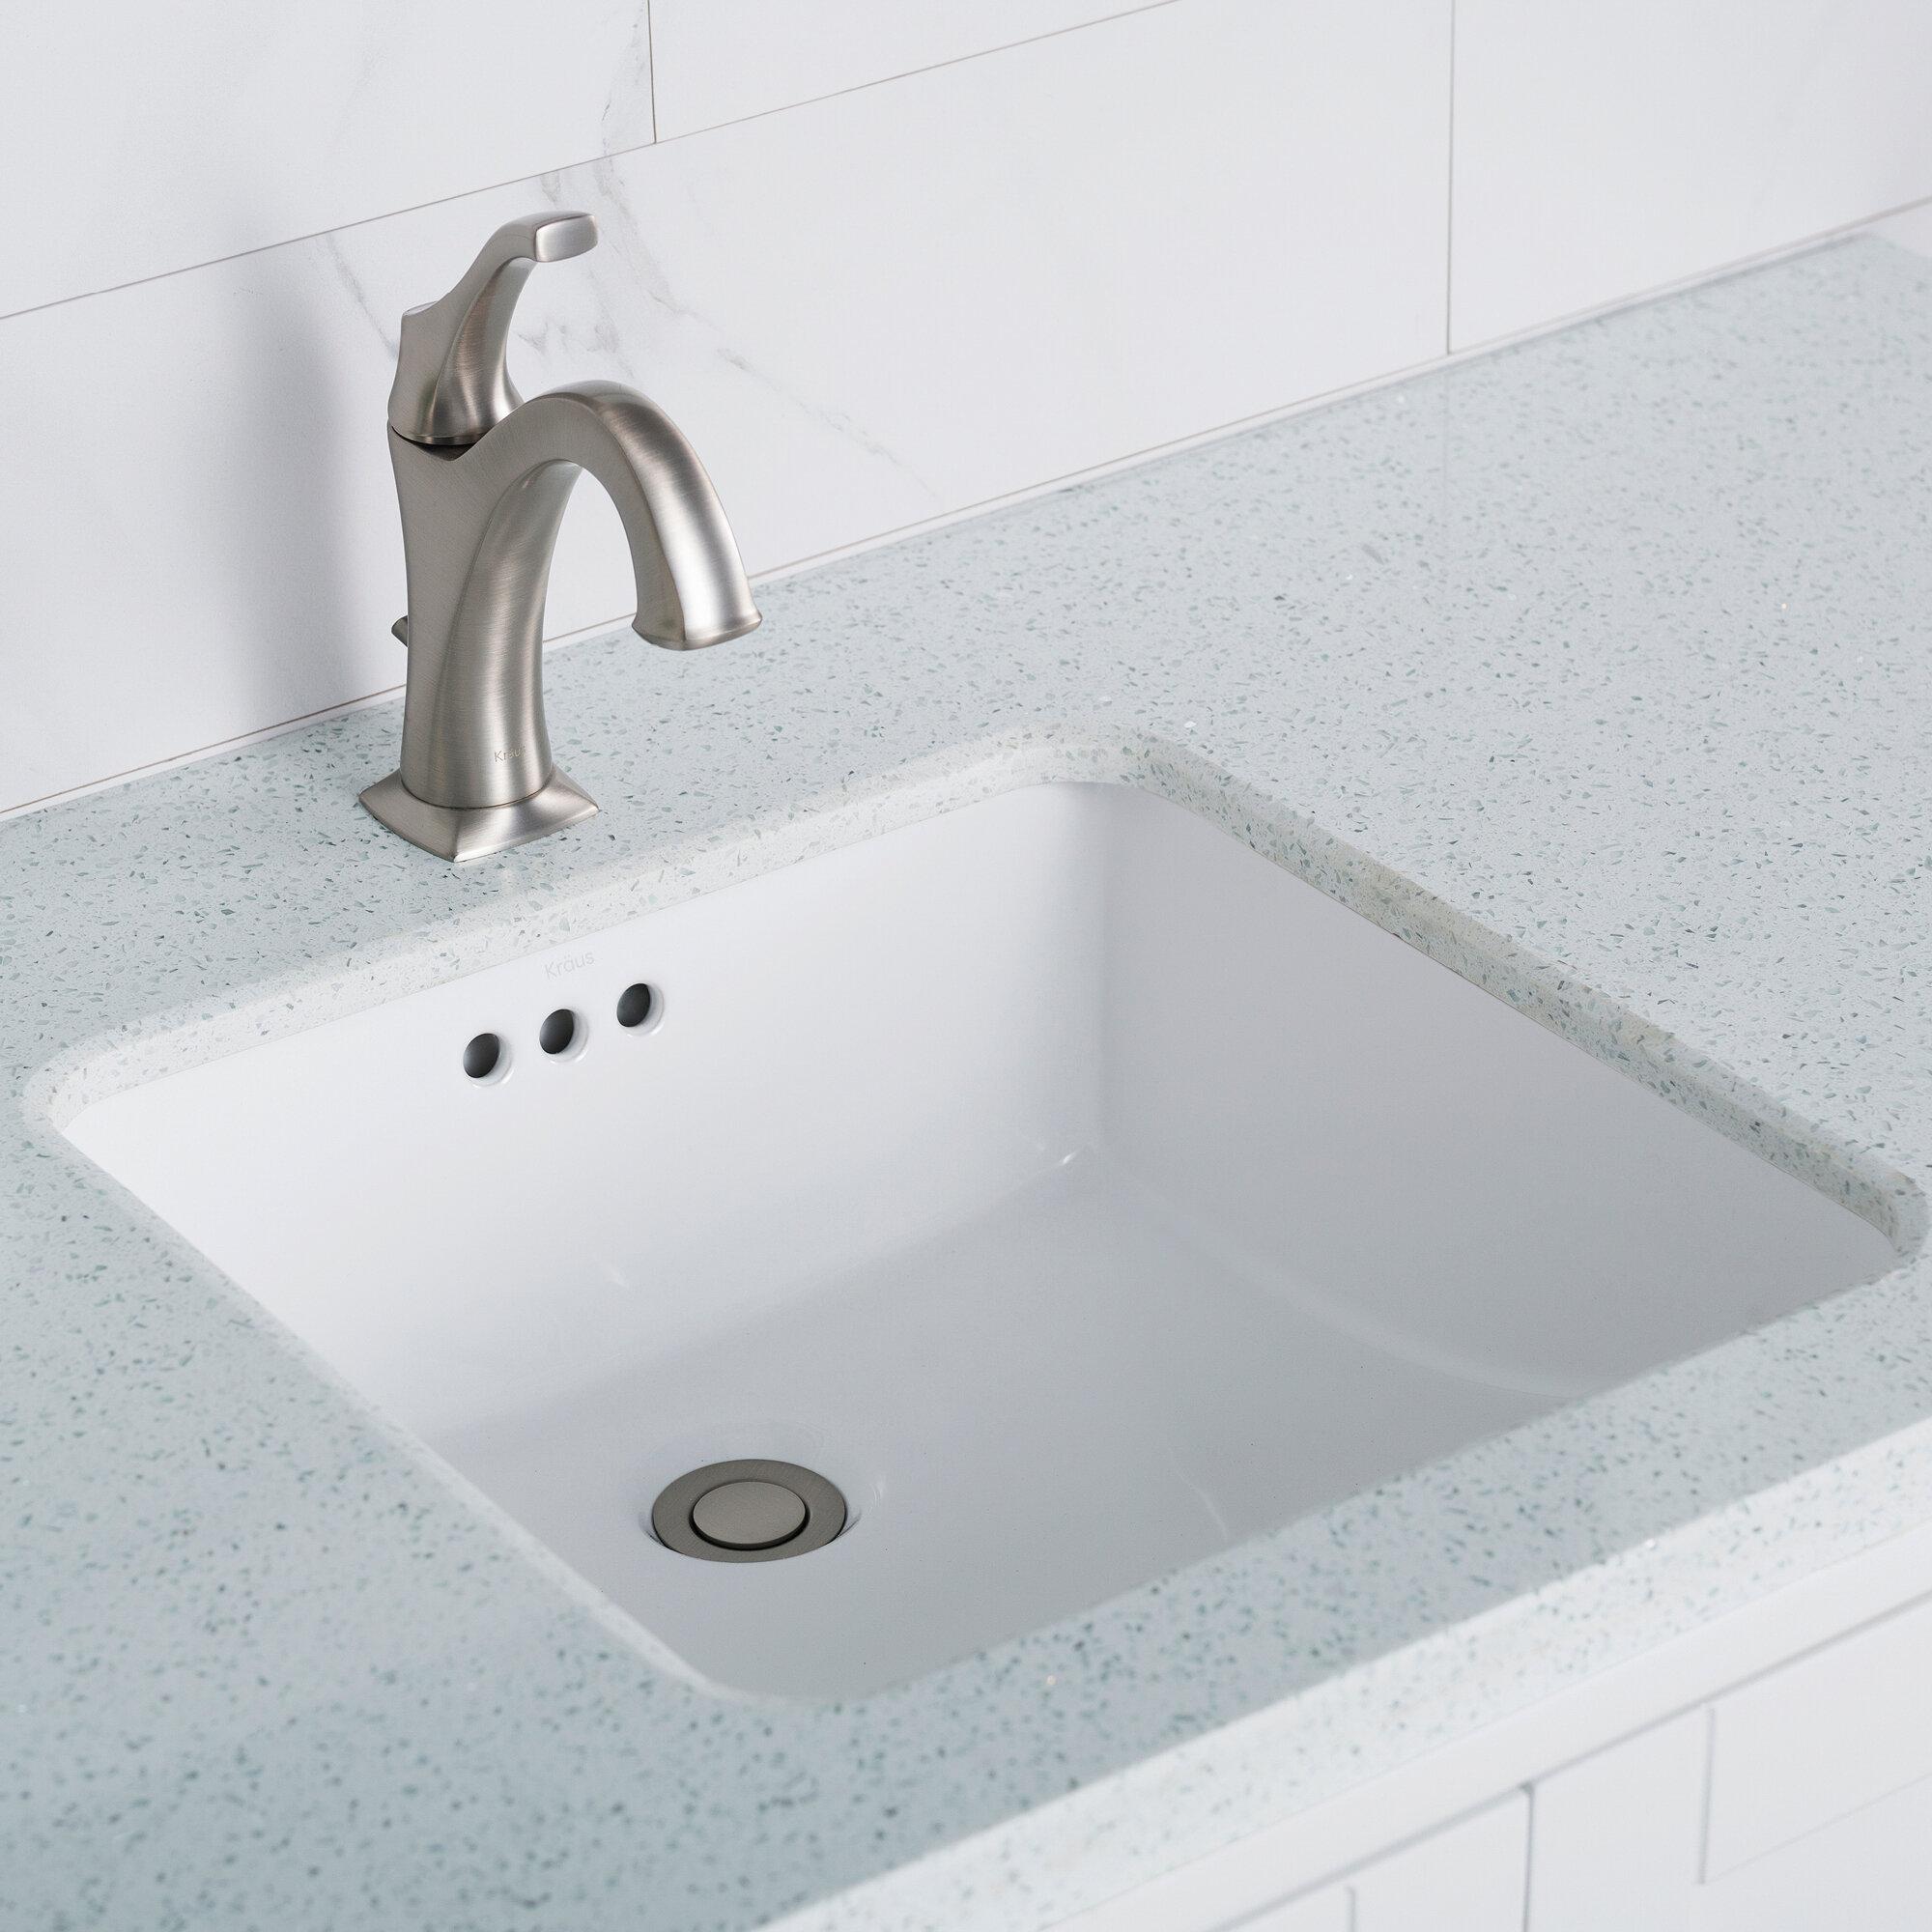 Kcu 231 kraus elavo ceramic square undermount bathroom sink with overflow reviews wayfair